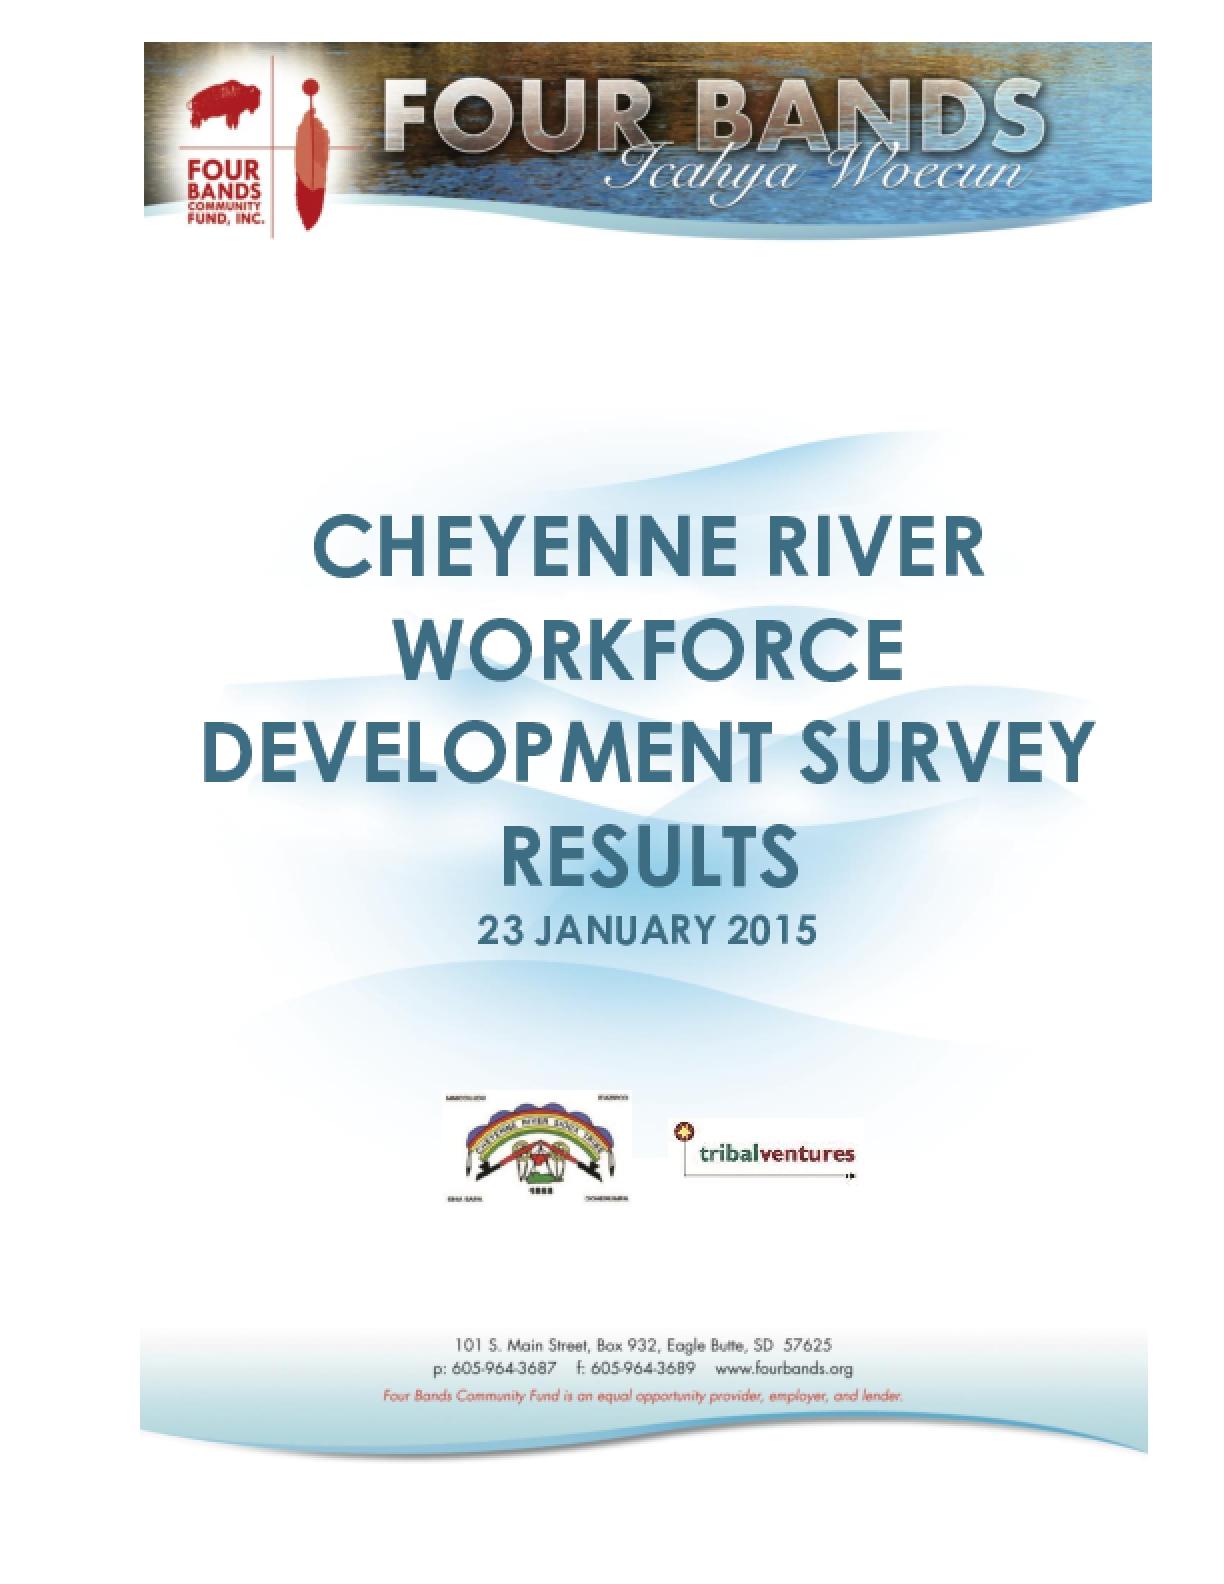 Cheyenne River Workforce Development Survey Results